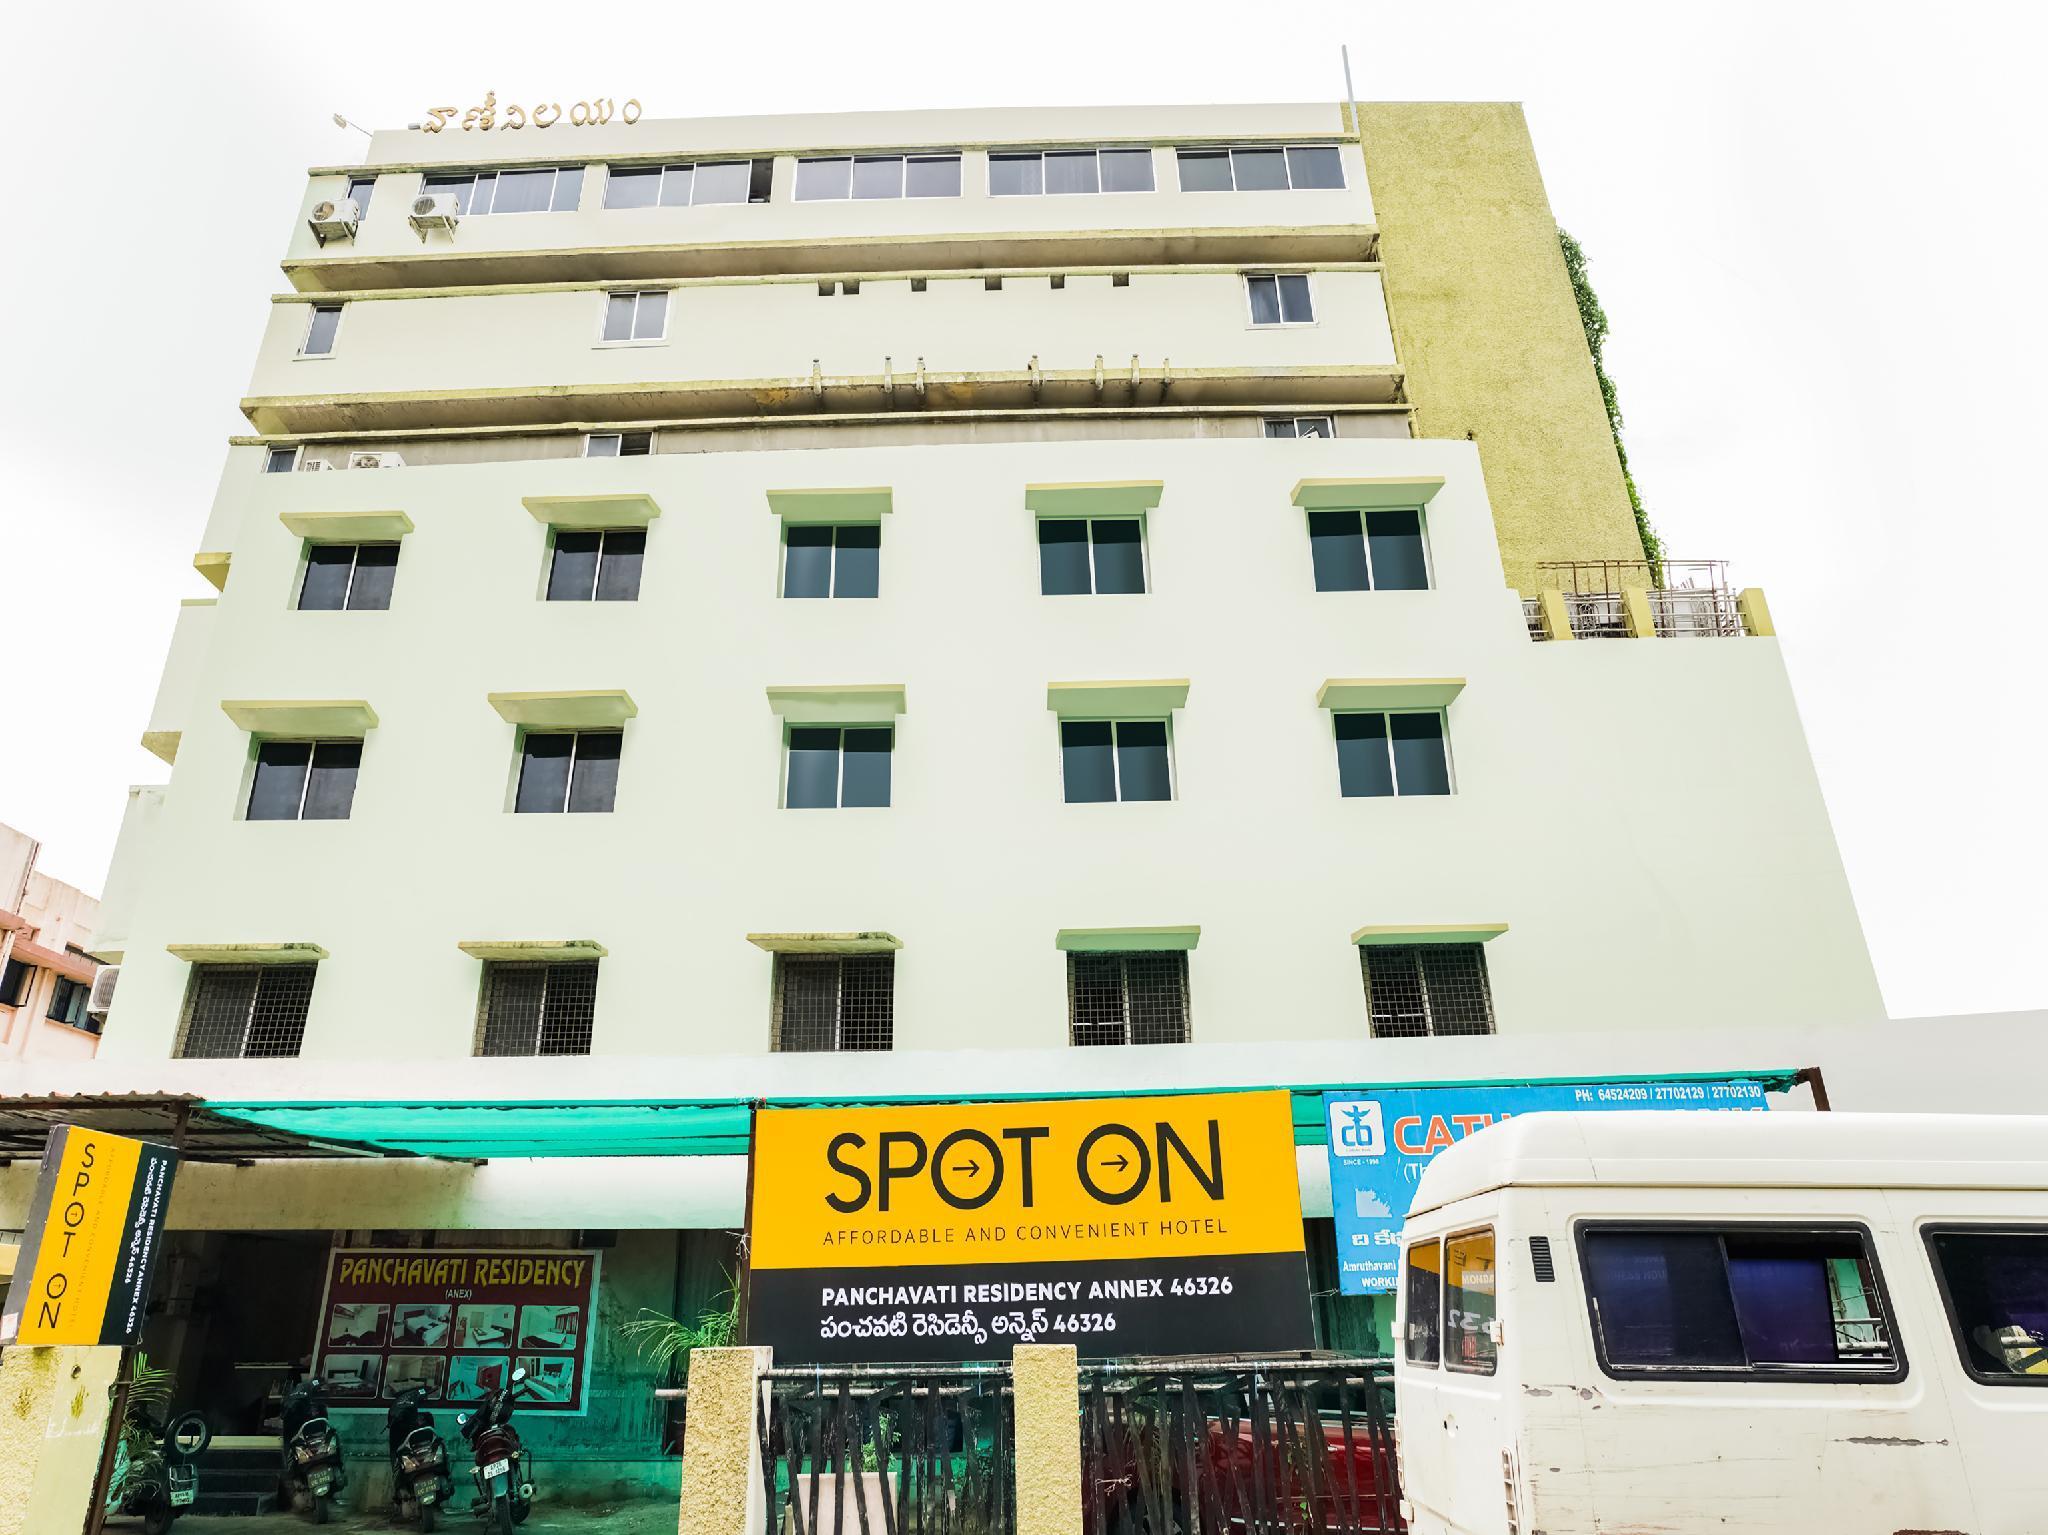 SPOT ON 46326 Panchavati Residency Annex